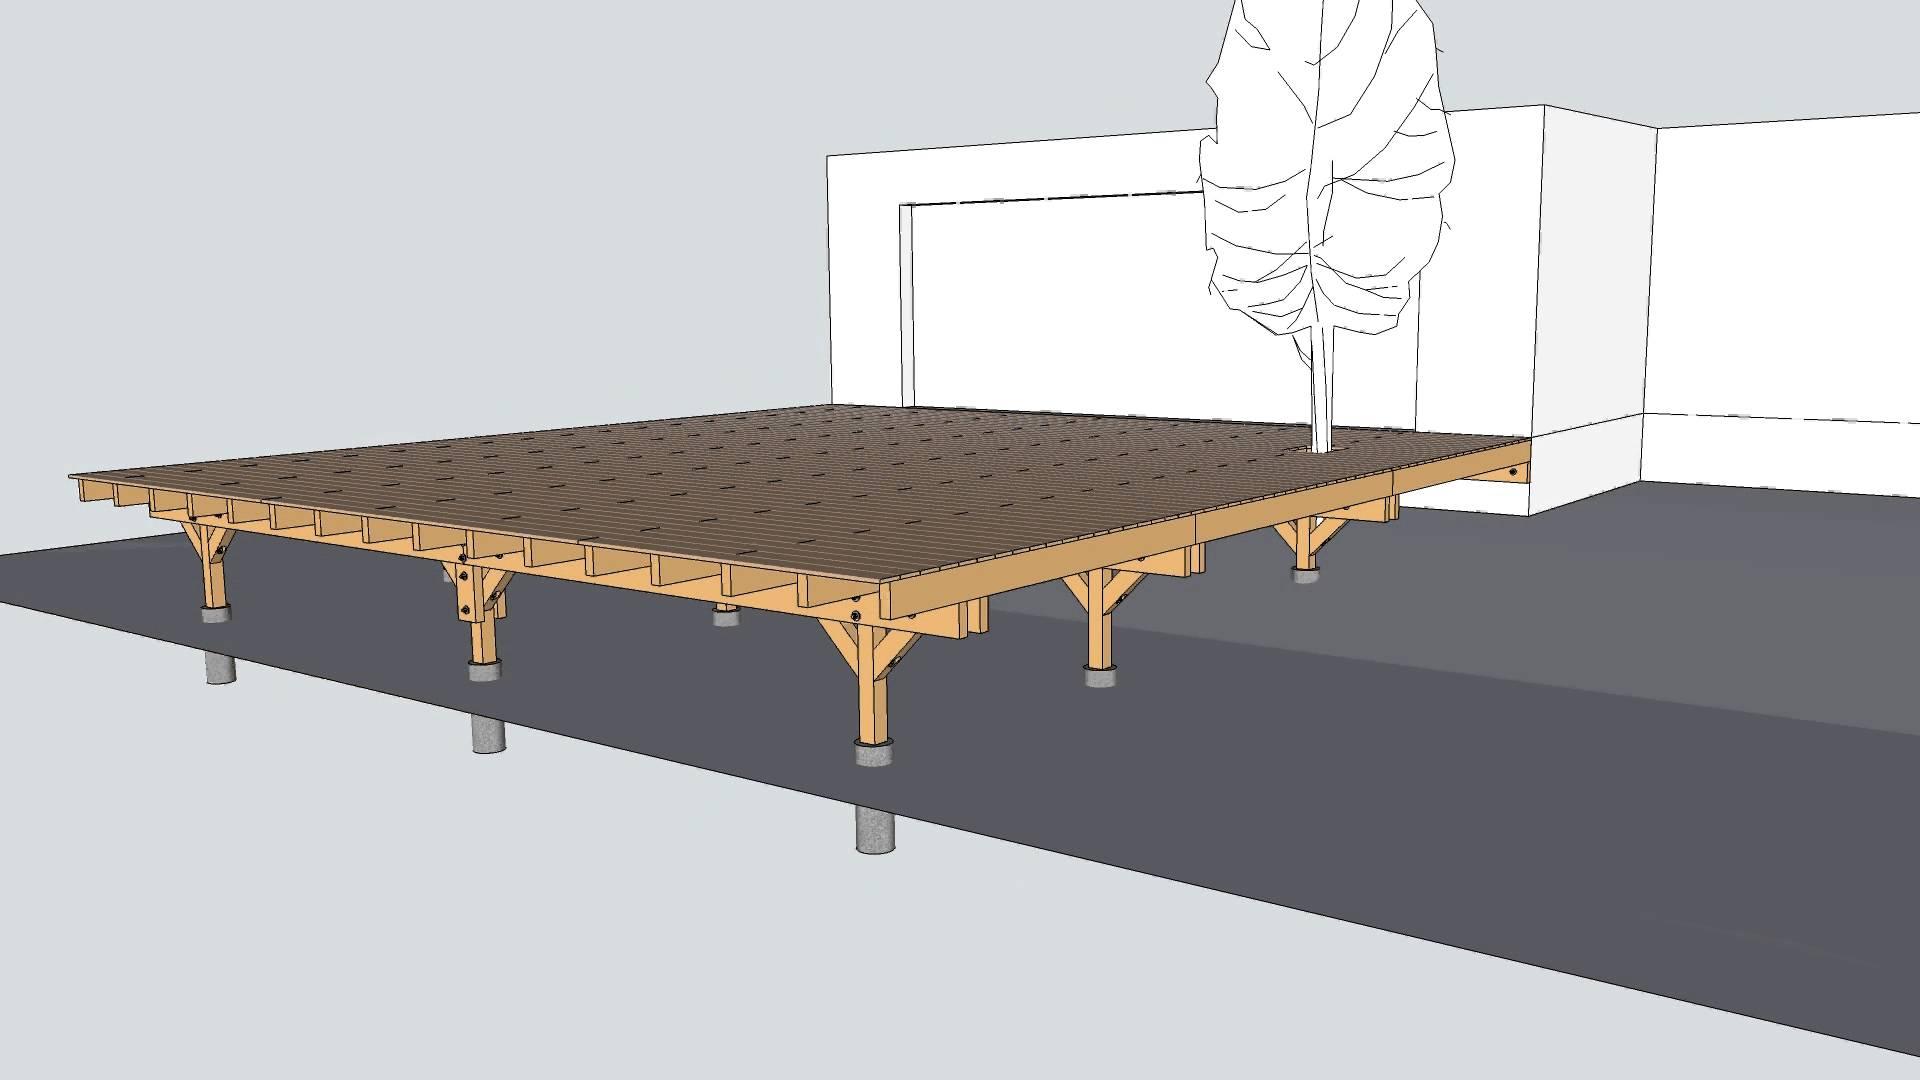 terrasse sur pilotis leroy merlin nos conseils. Black Bedroom Furniture Sets. Home Design Ideas